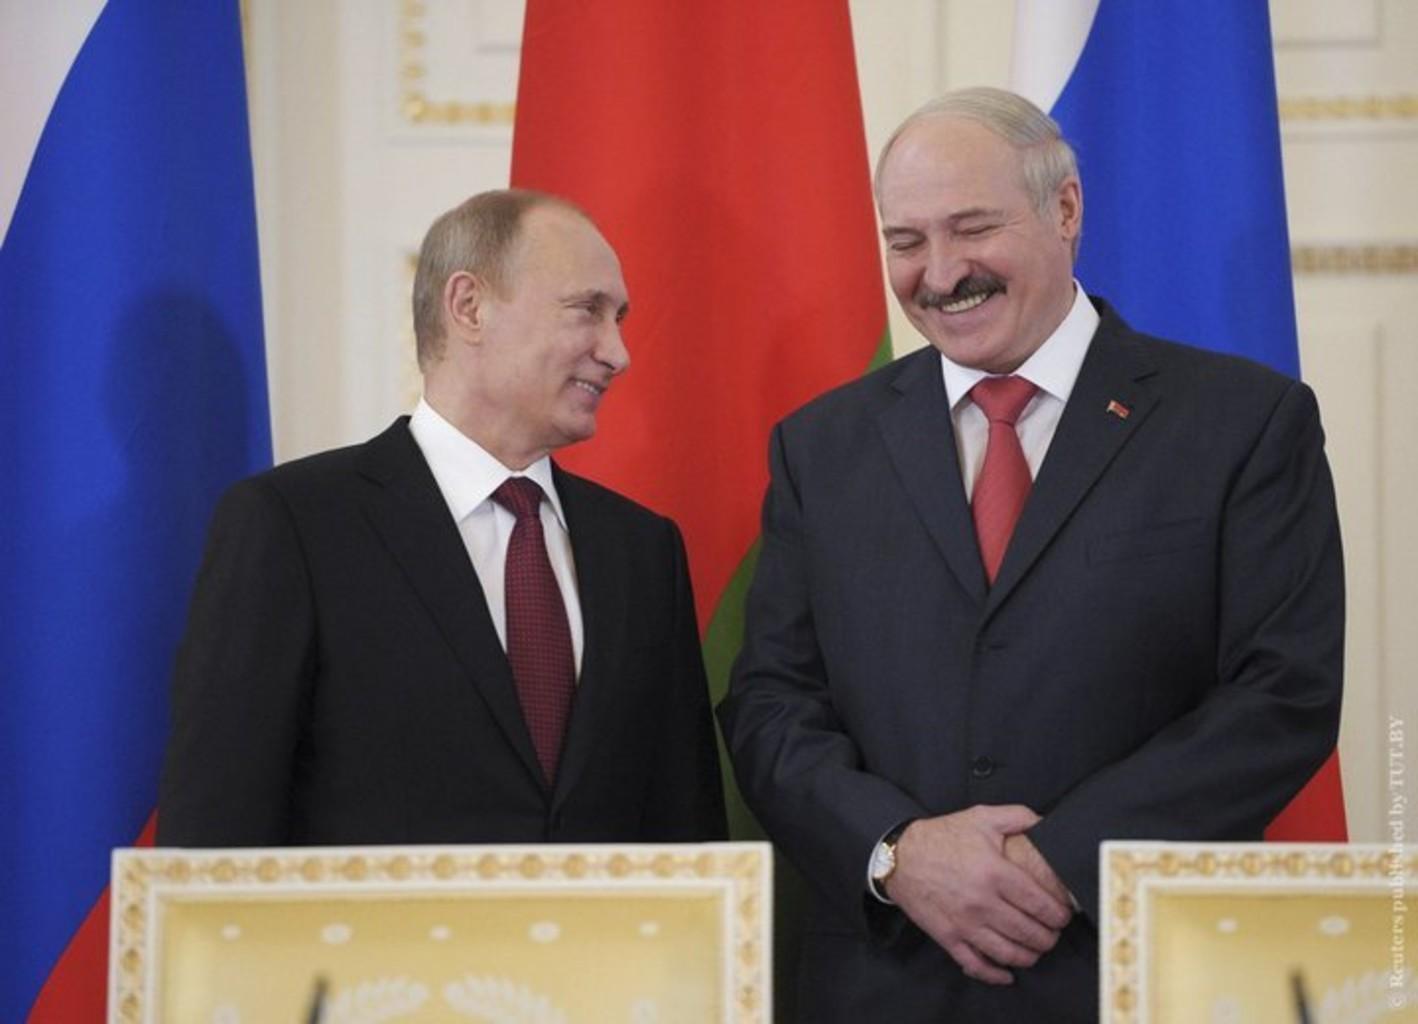 Putin lukashenko 15032013 4